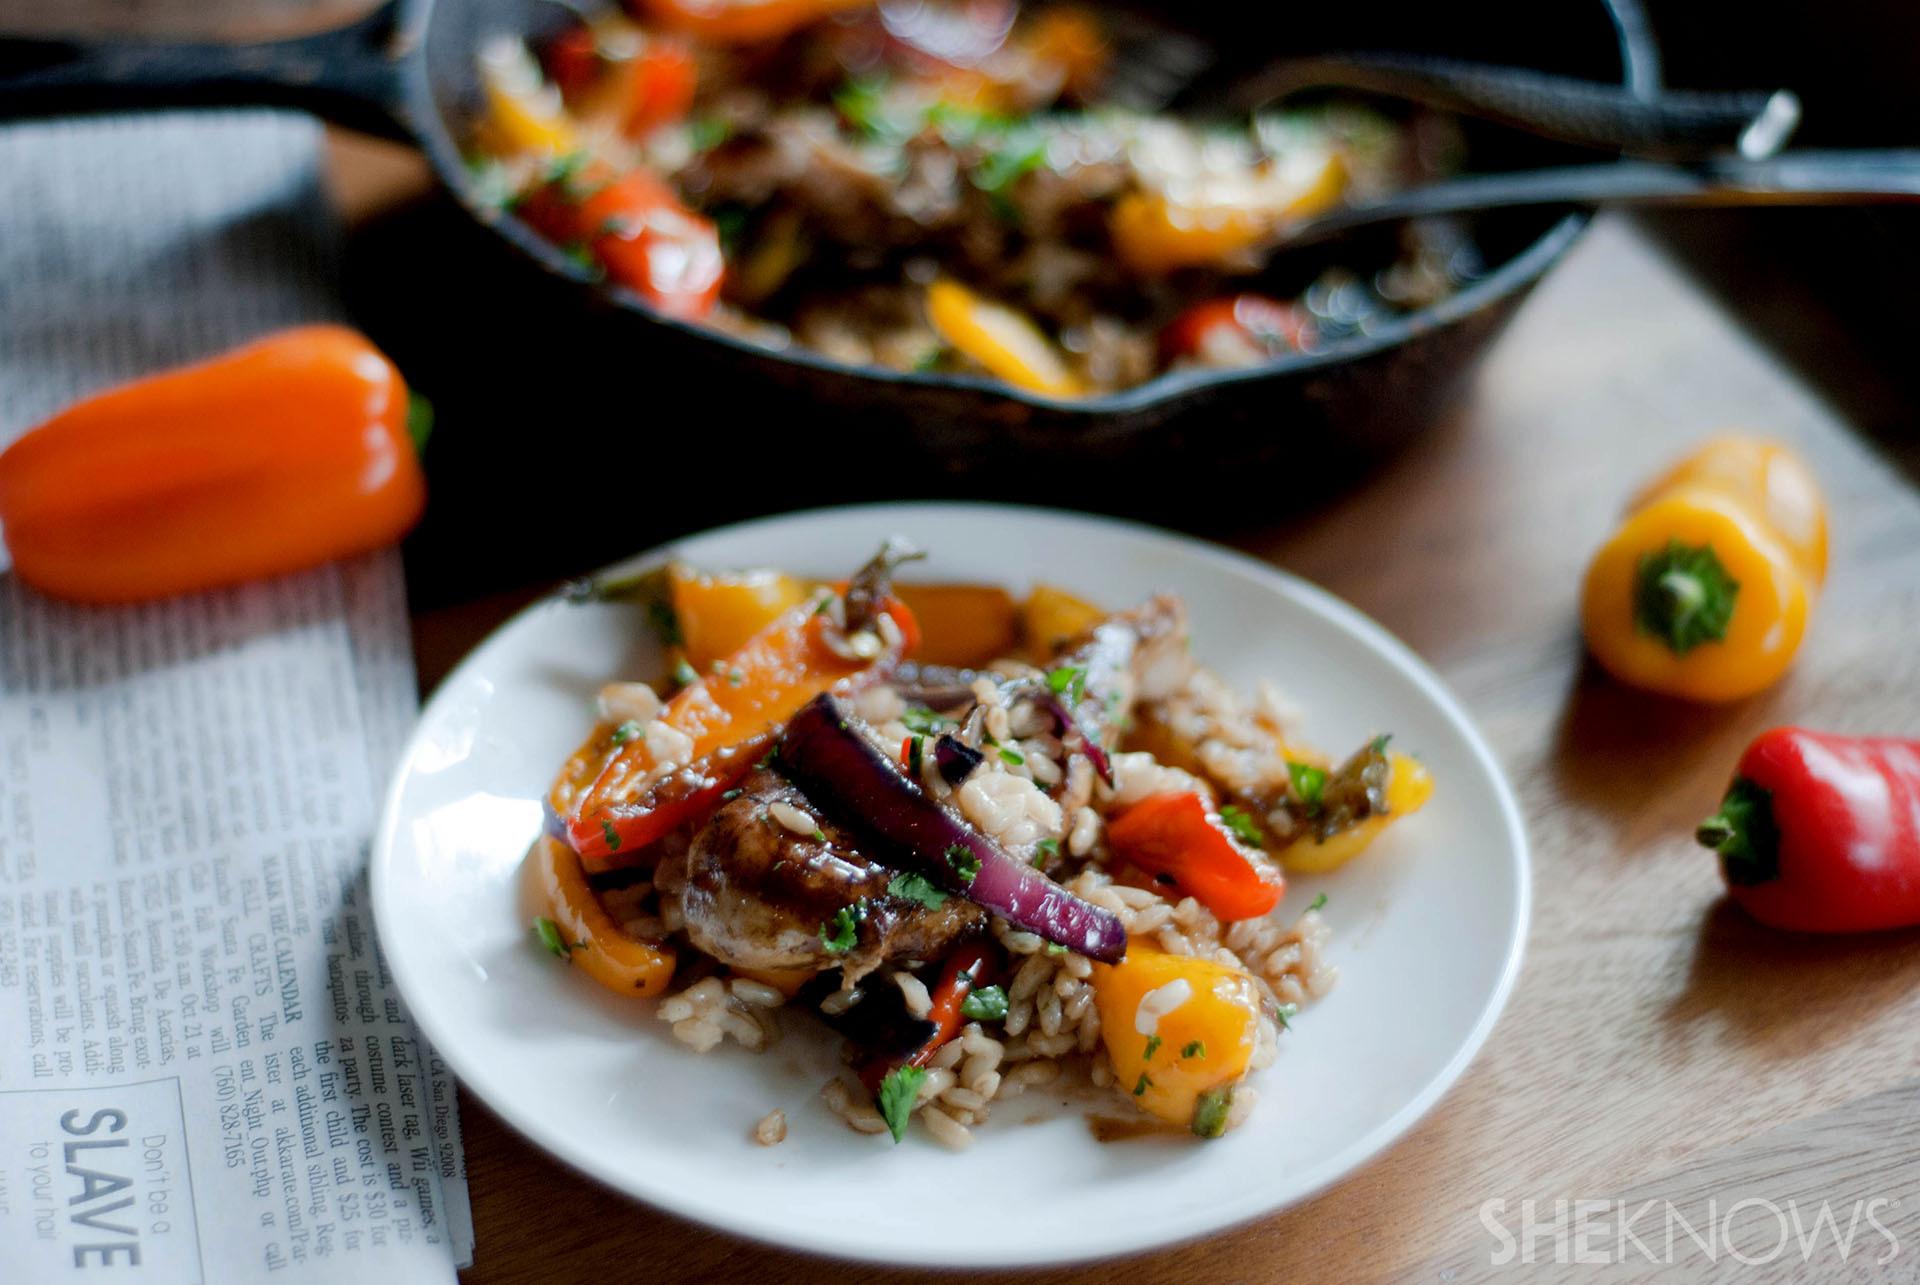 One-Pot Wonder: Rustic maple balsamic brown rice chicken skillet